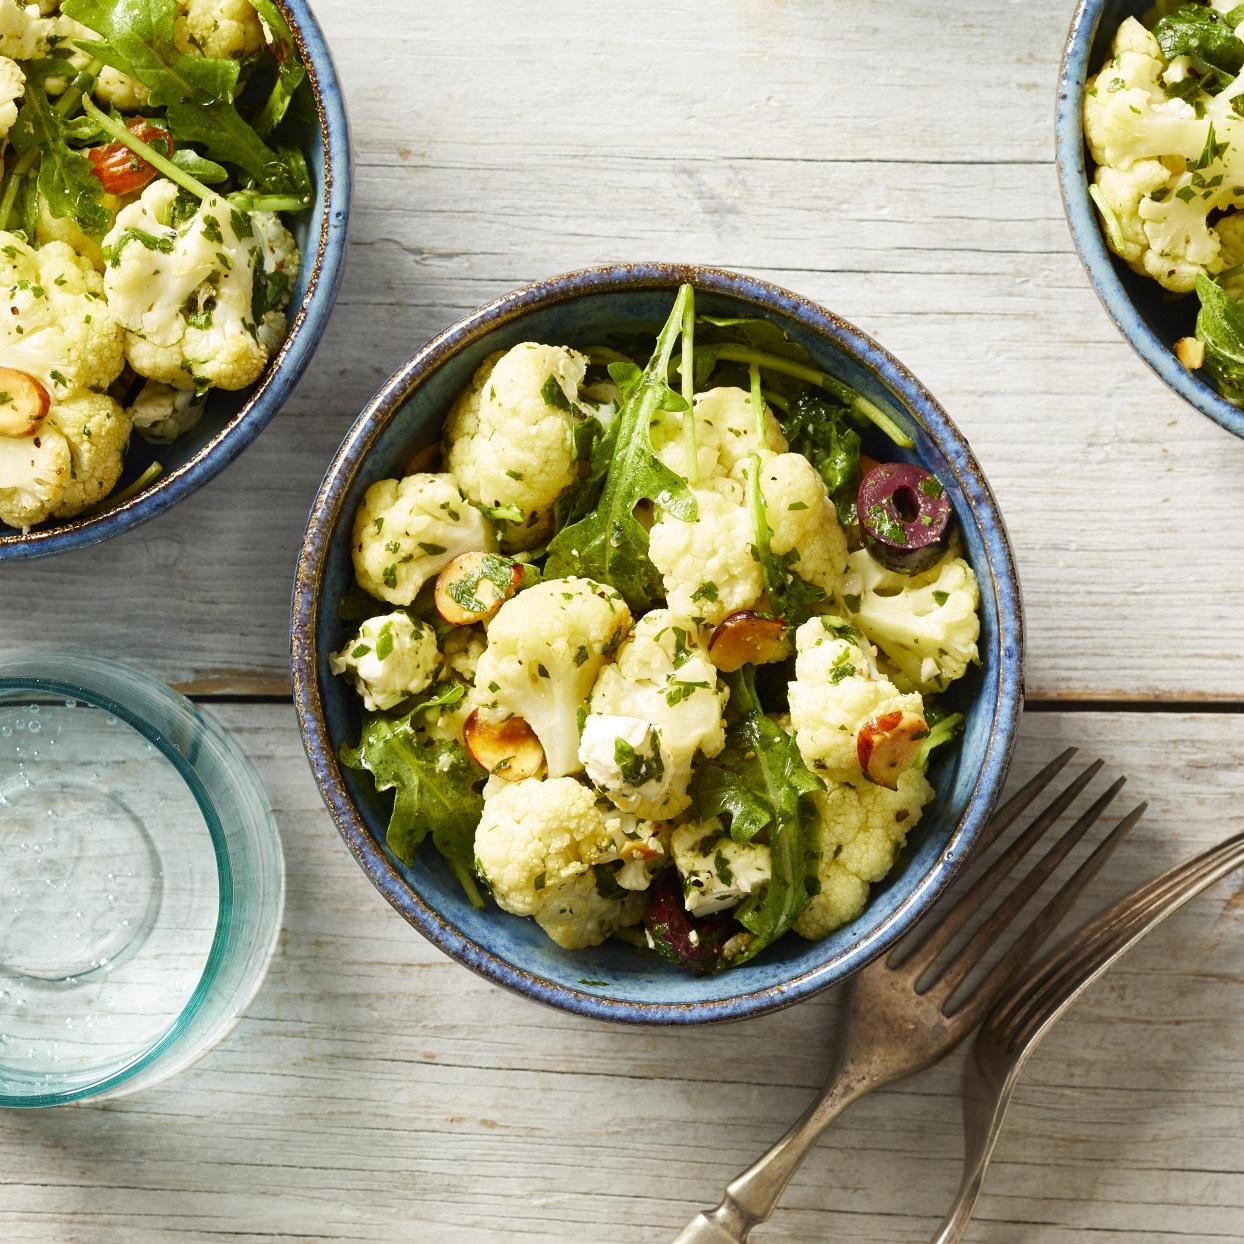 Roasted Cauliflower Salad with Almonds, Olives & Feta Carolyn Casner